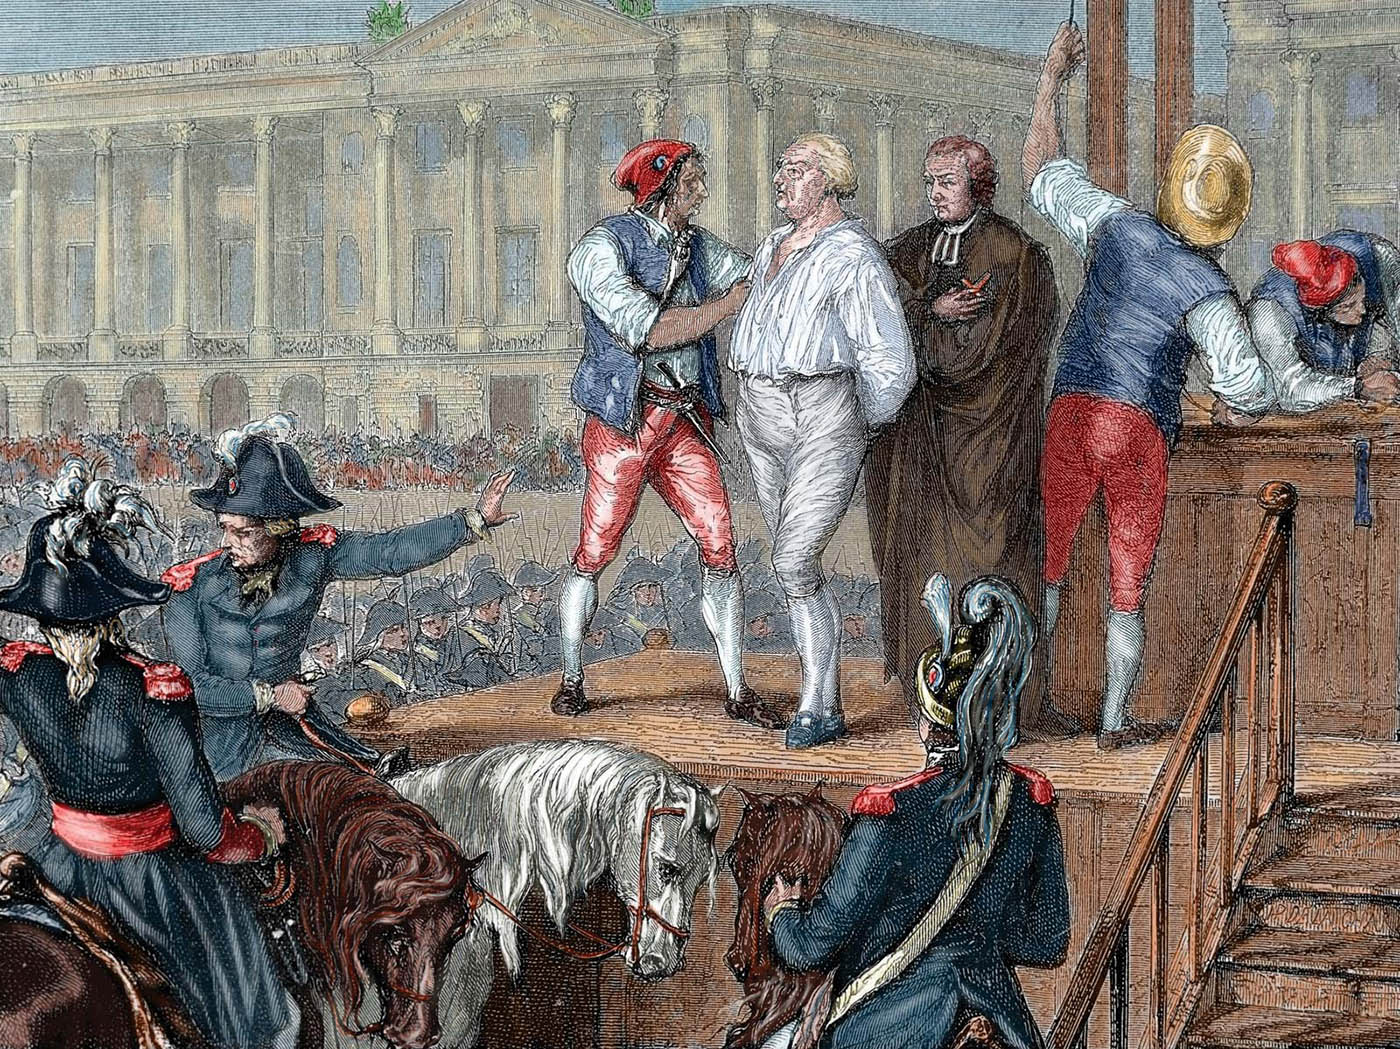 Anónimo. Ejecución de Luis XVI. Siglo XIX.